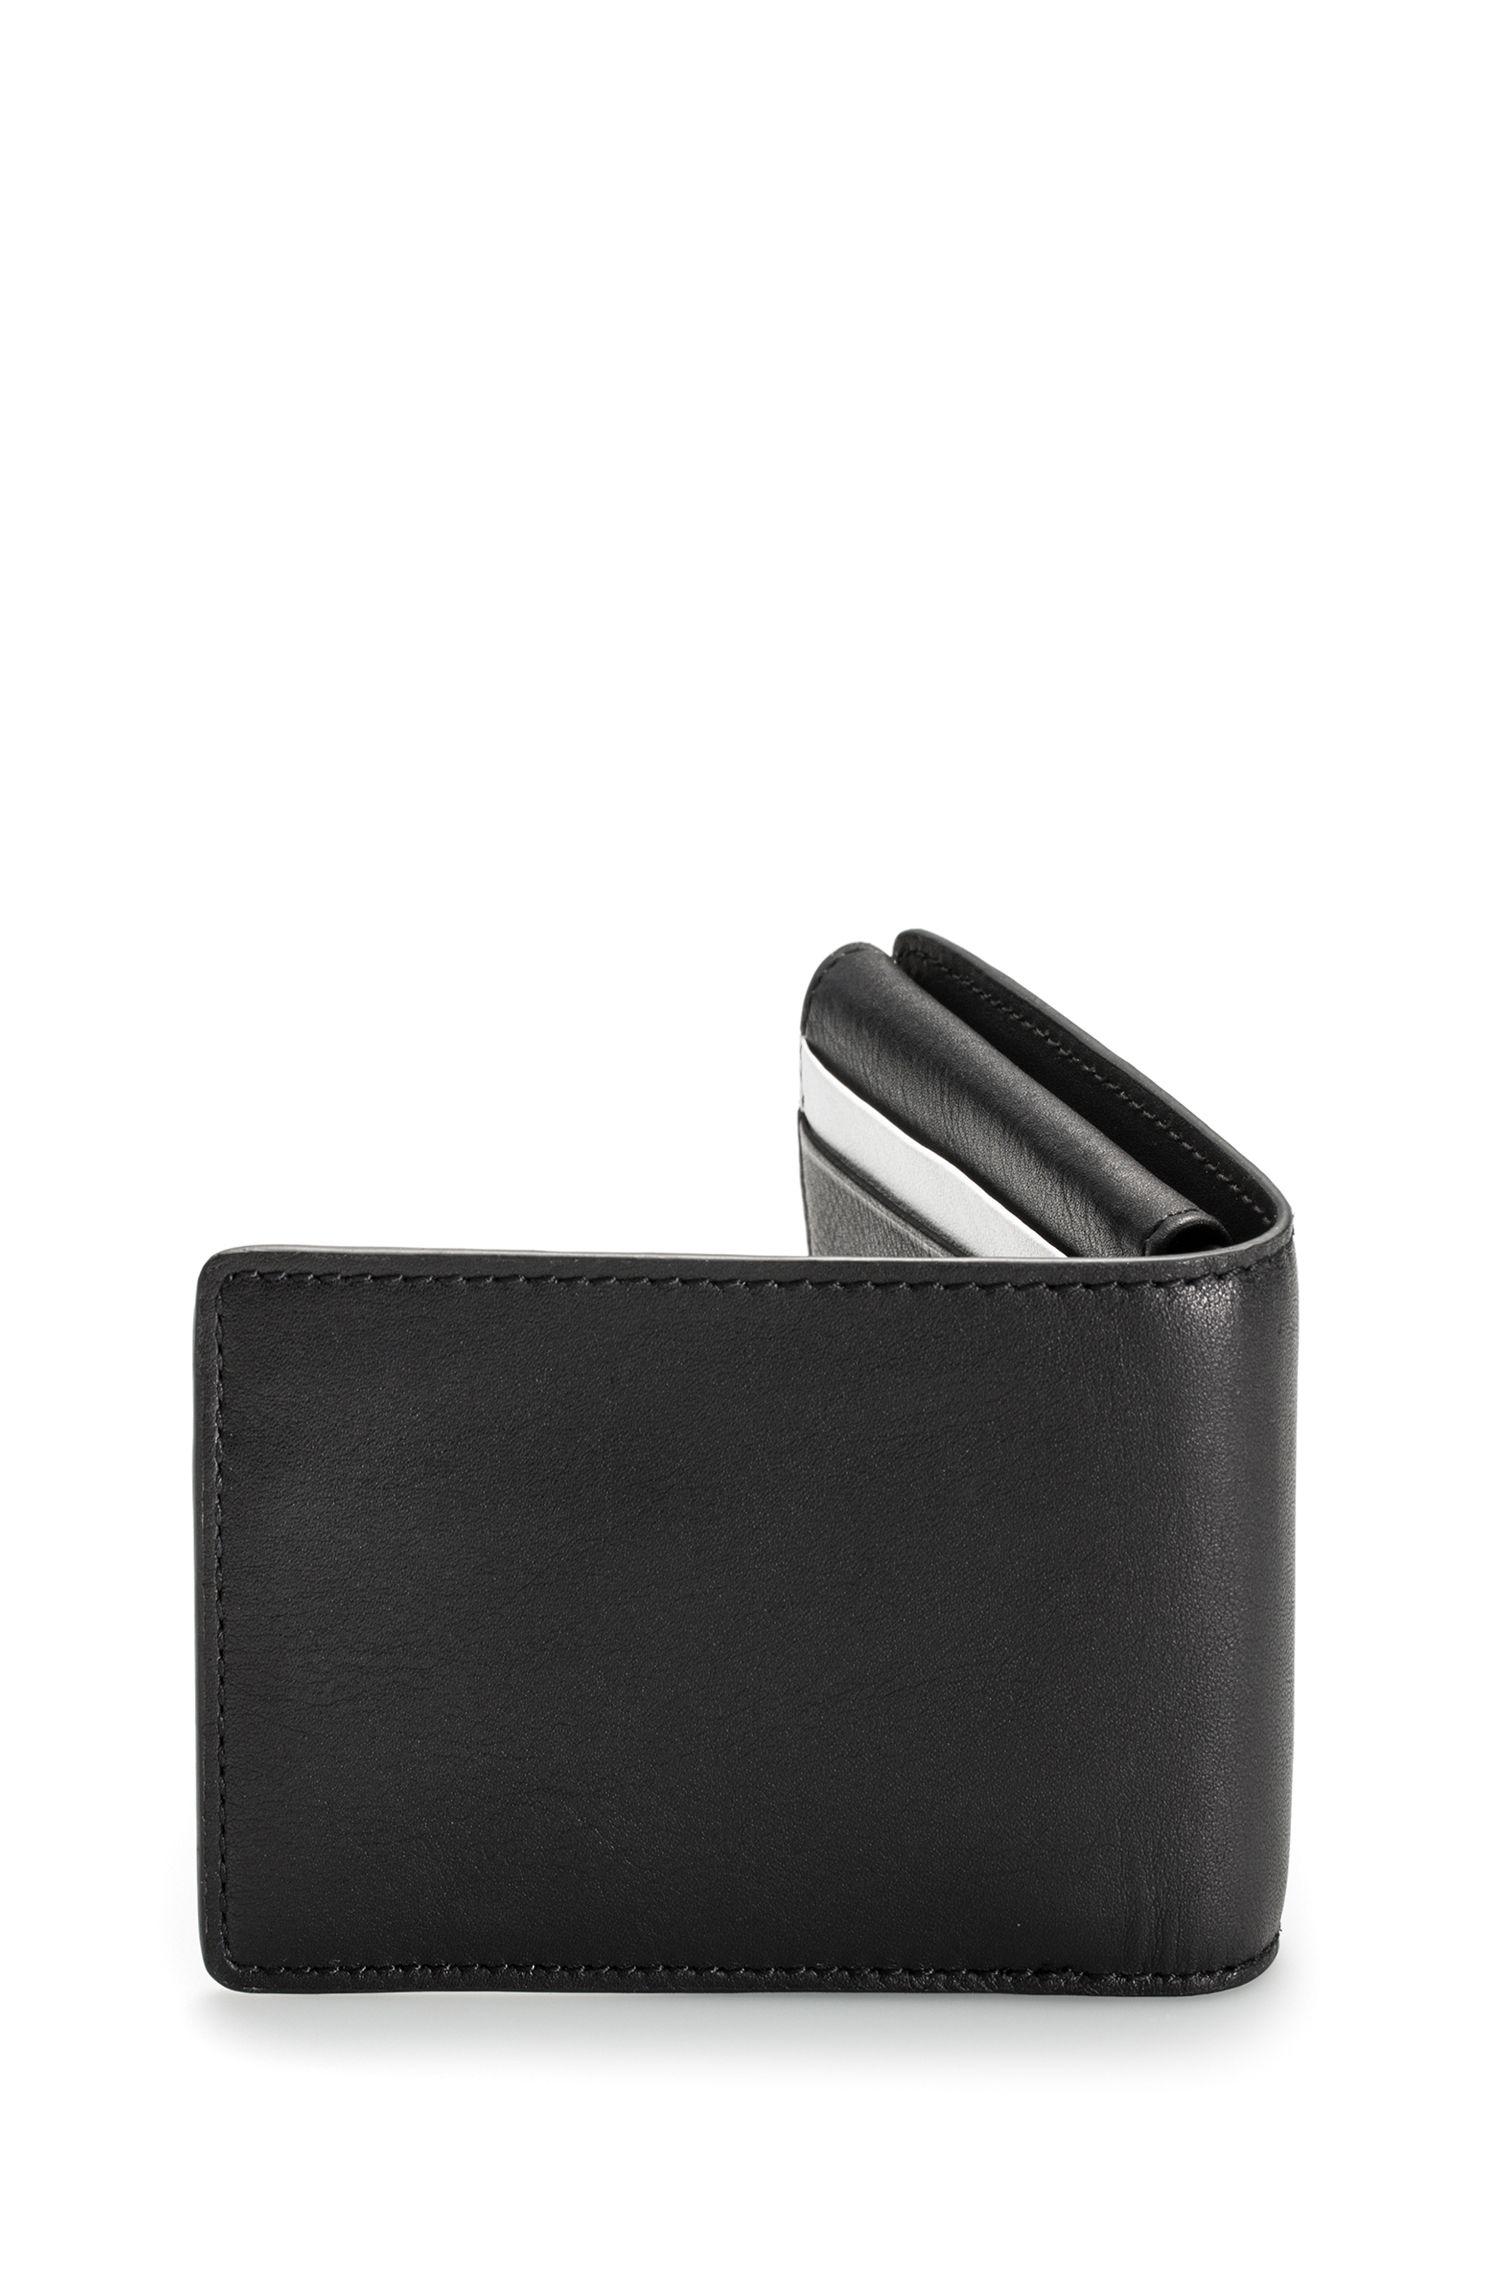 Leather Billfold Wallet | Subway , Black